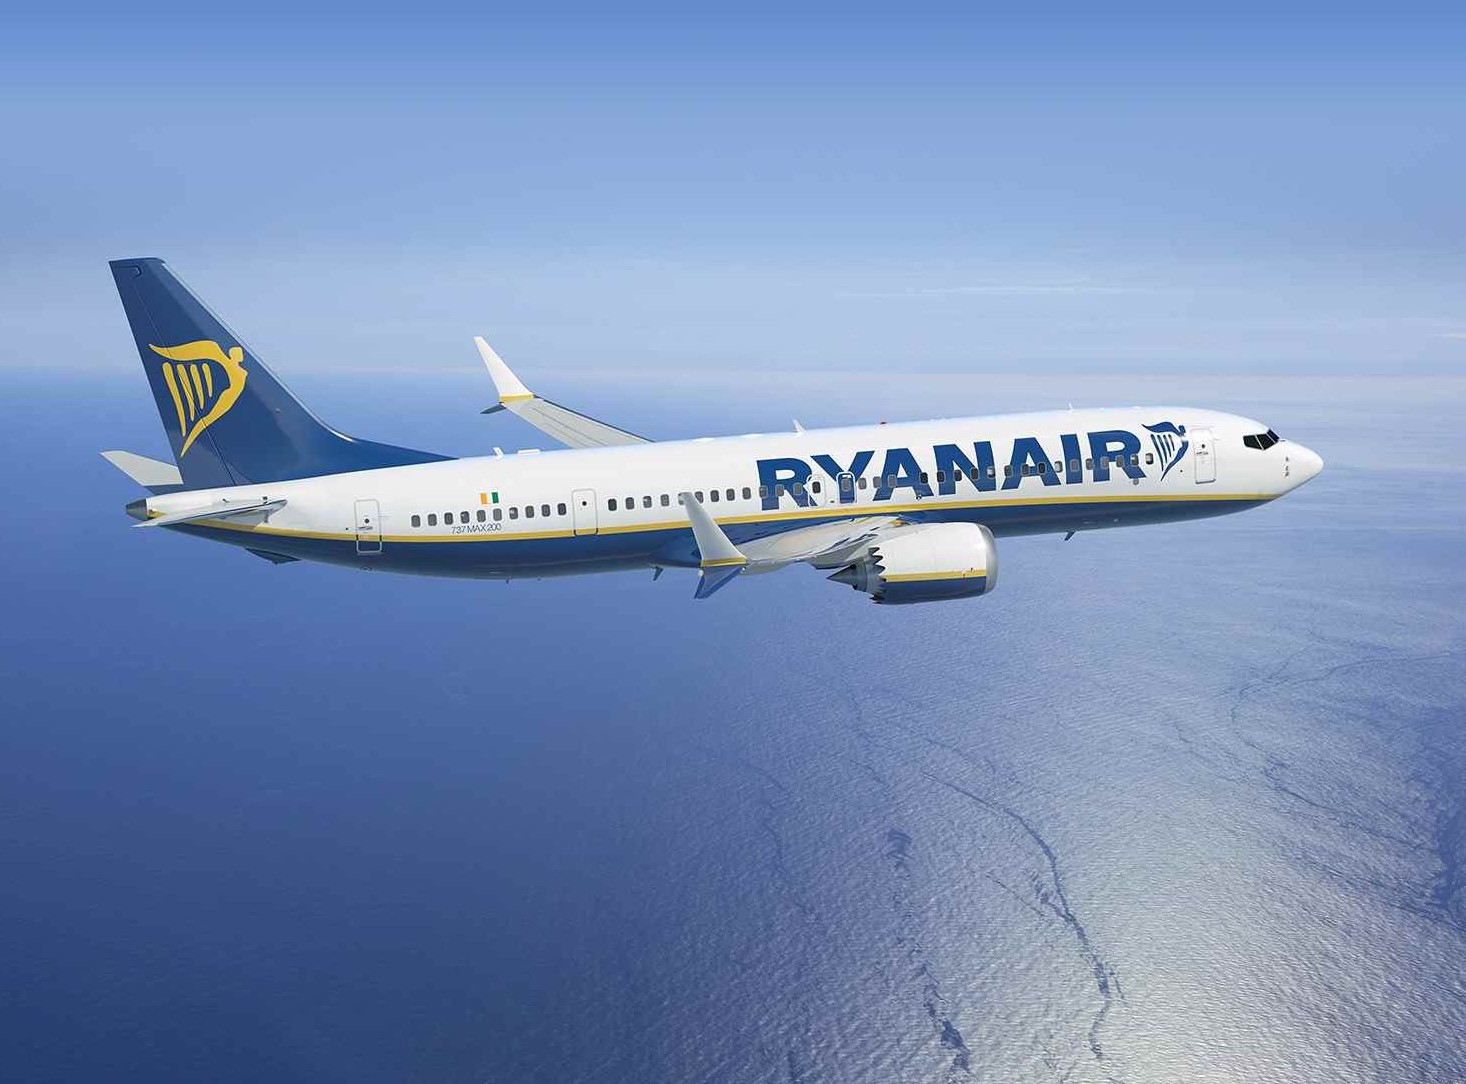 Ryanair condannata risarcimento passegge